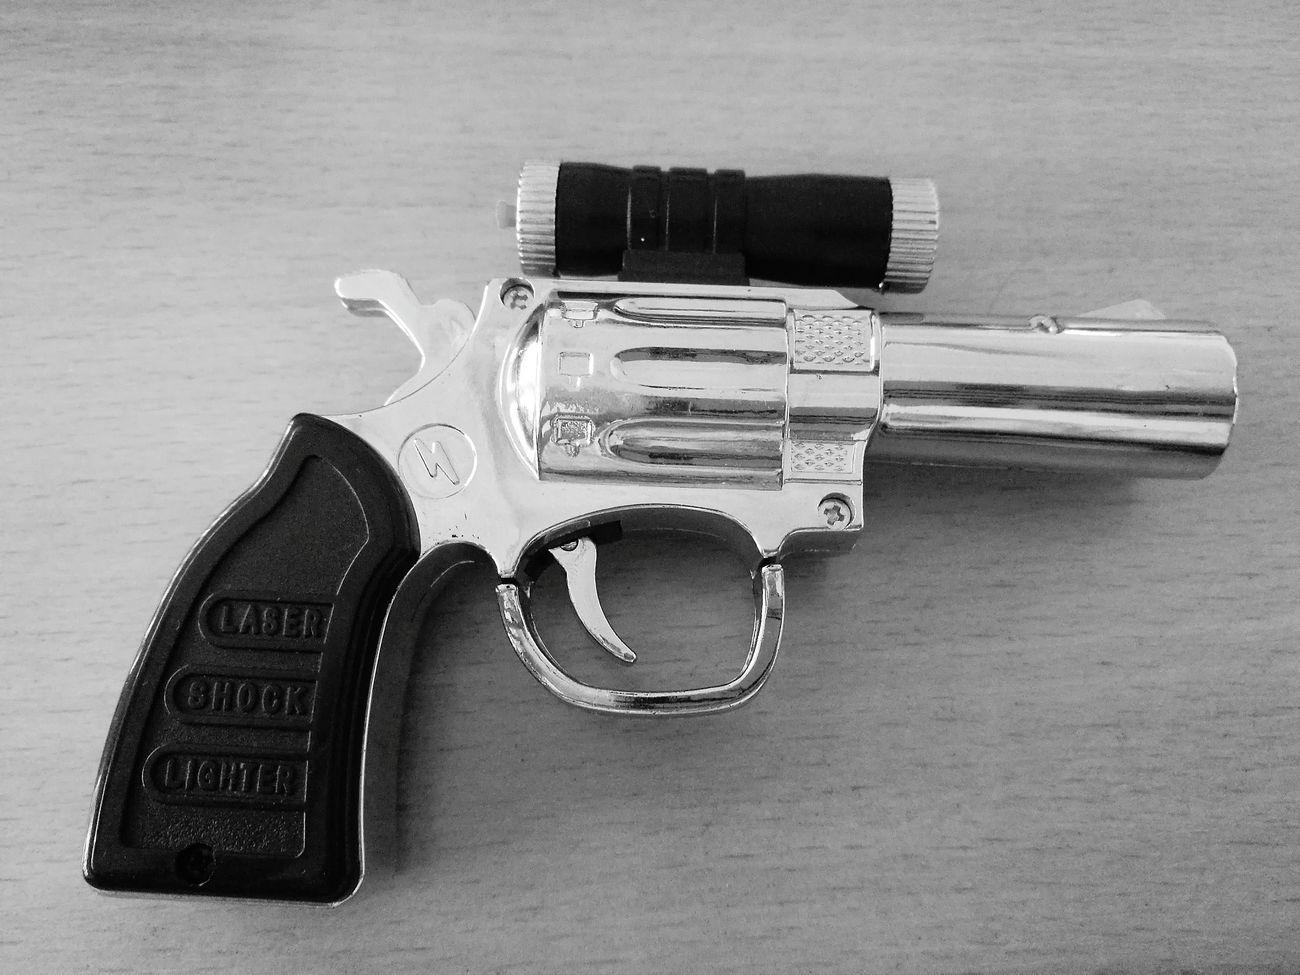 Toy gun Handgun Pistol Danger Gun Weapon Crime Table Black & Withe Toy